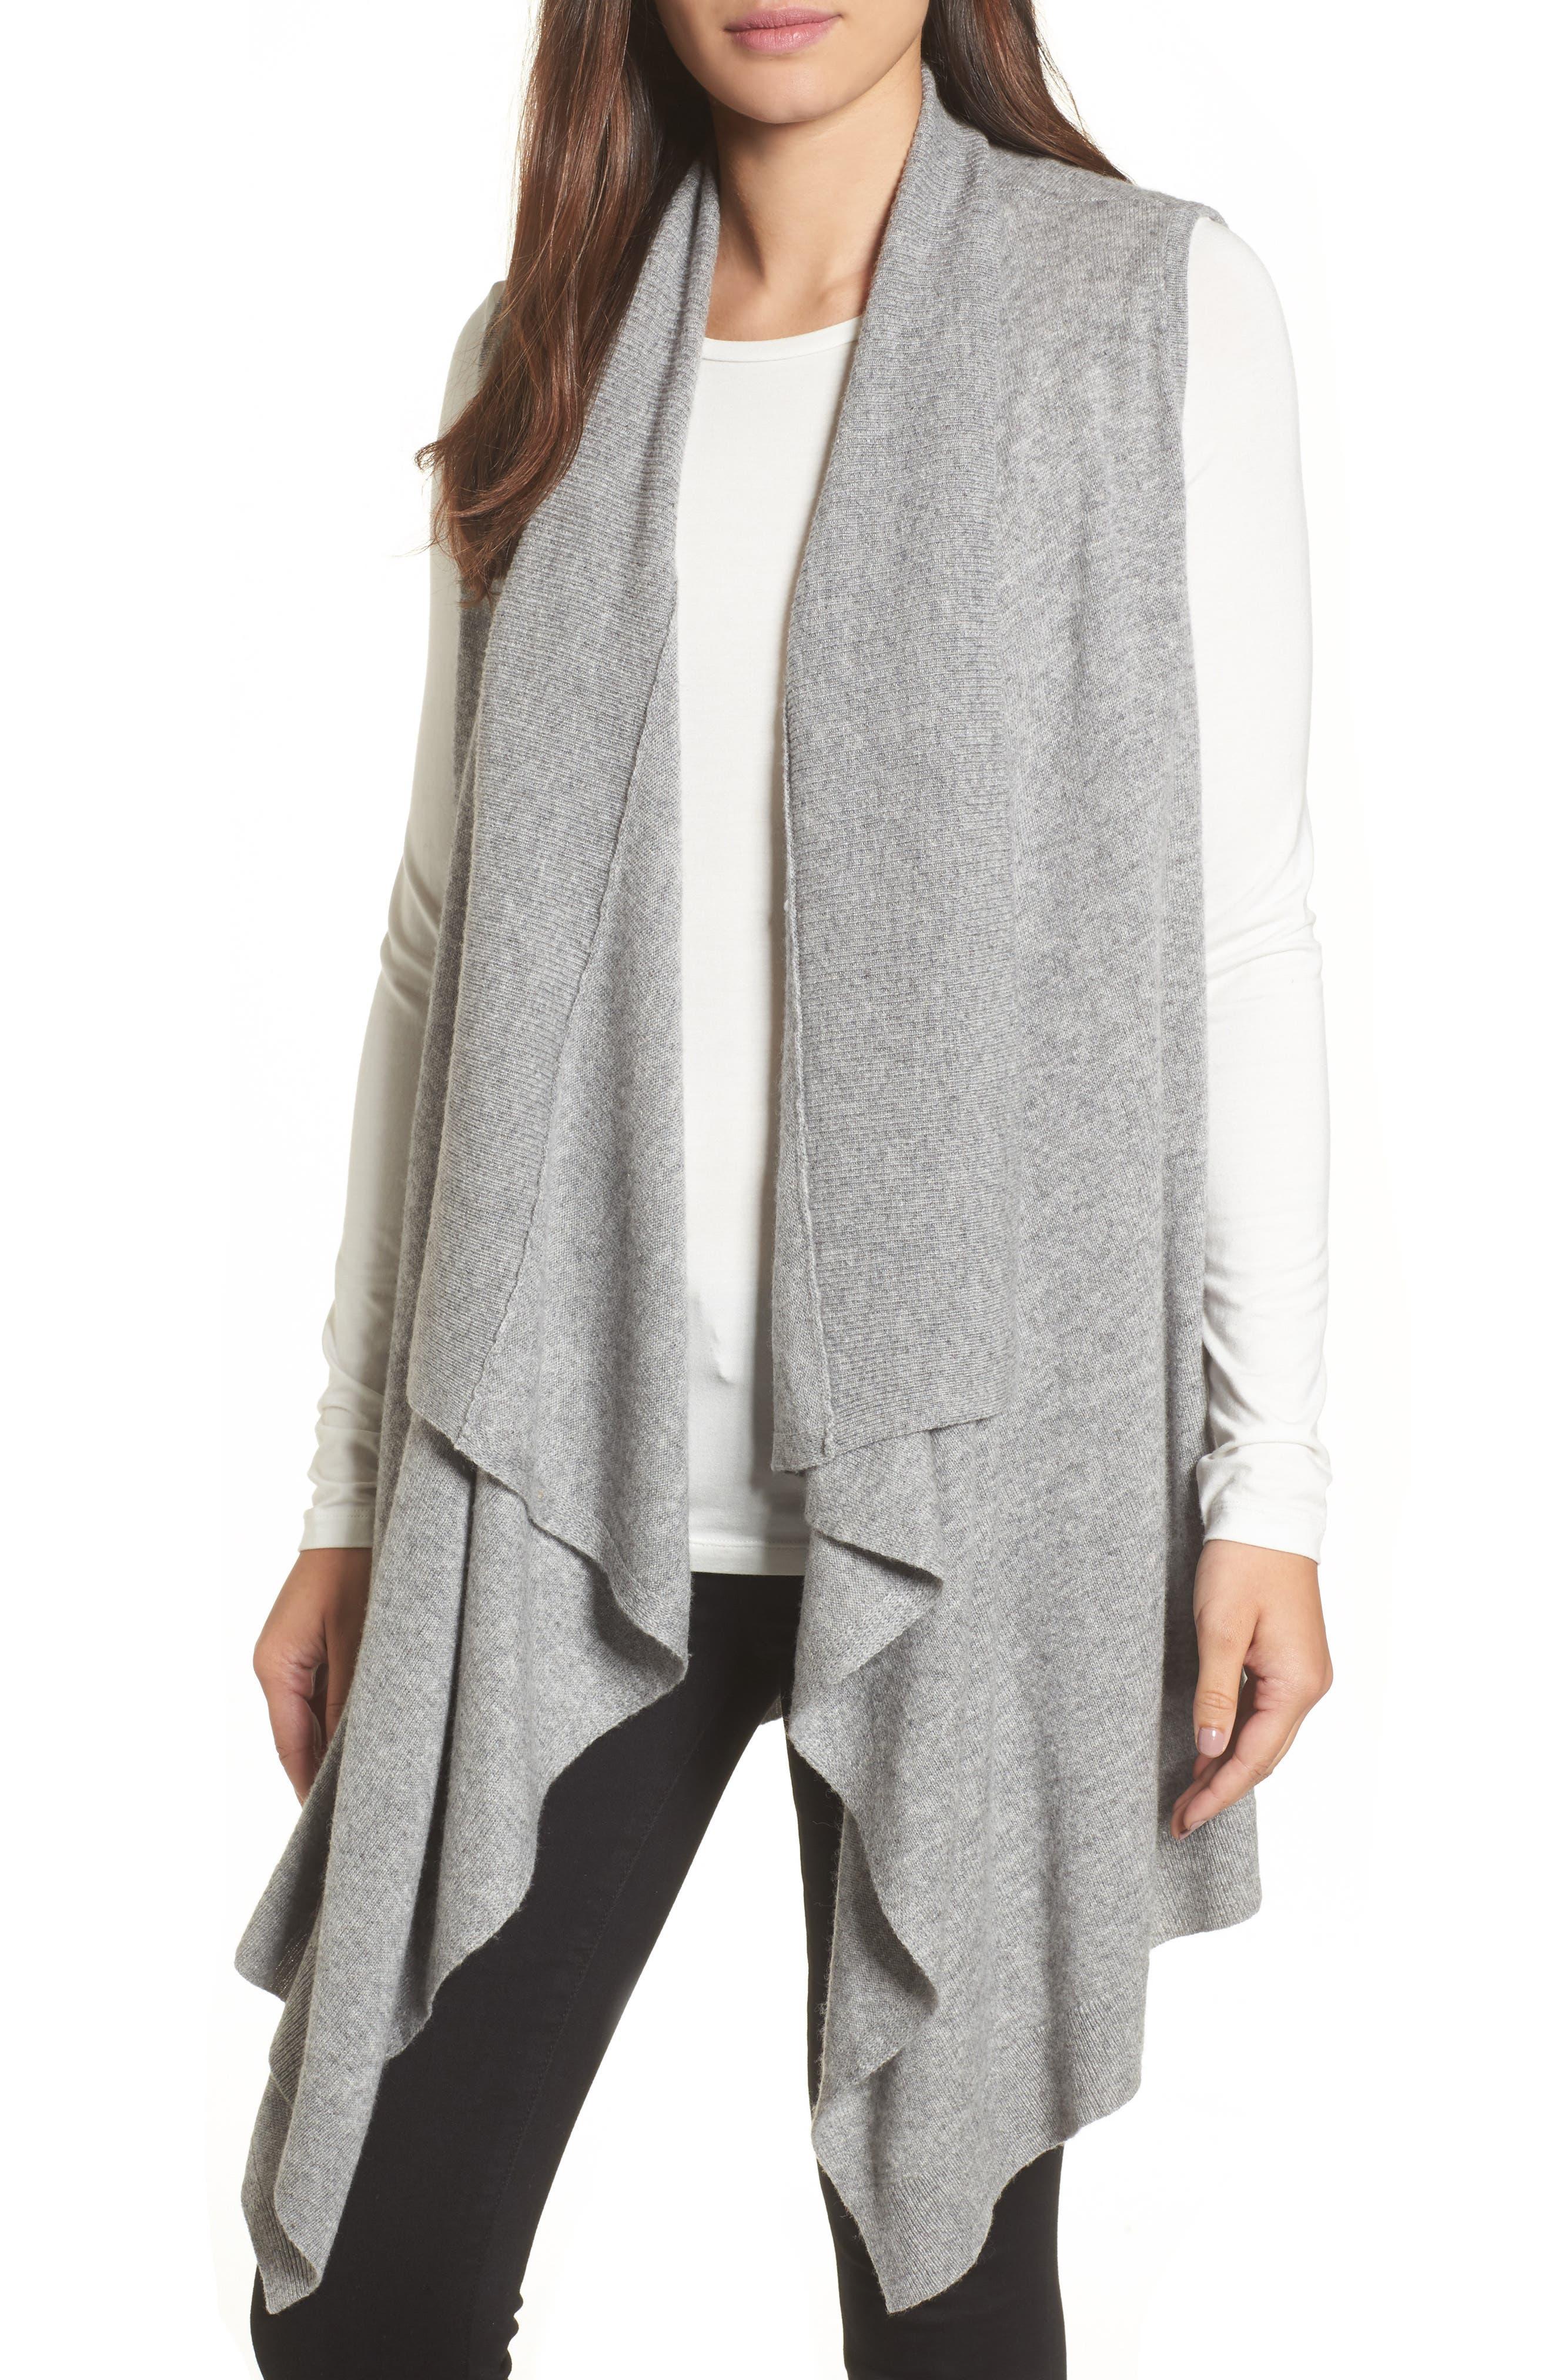 Alternate Image 1 Selected - Halogen® Wool & Cashmere Drape Front Sweater Vest